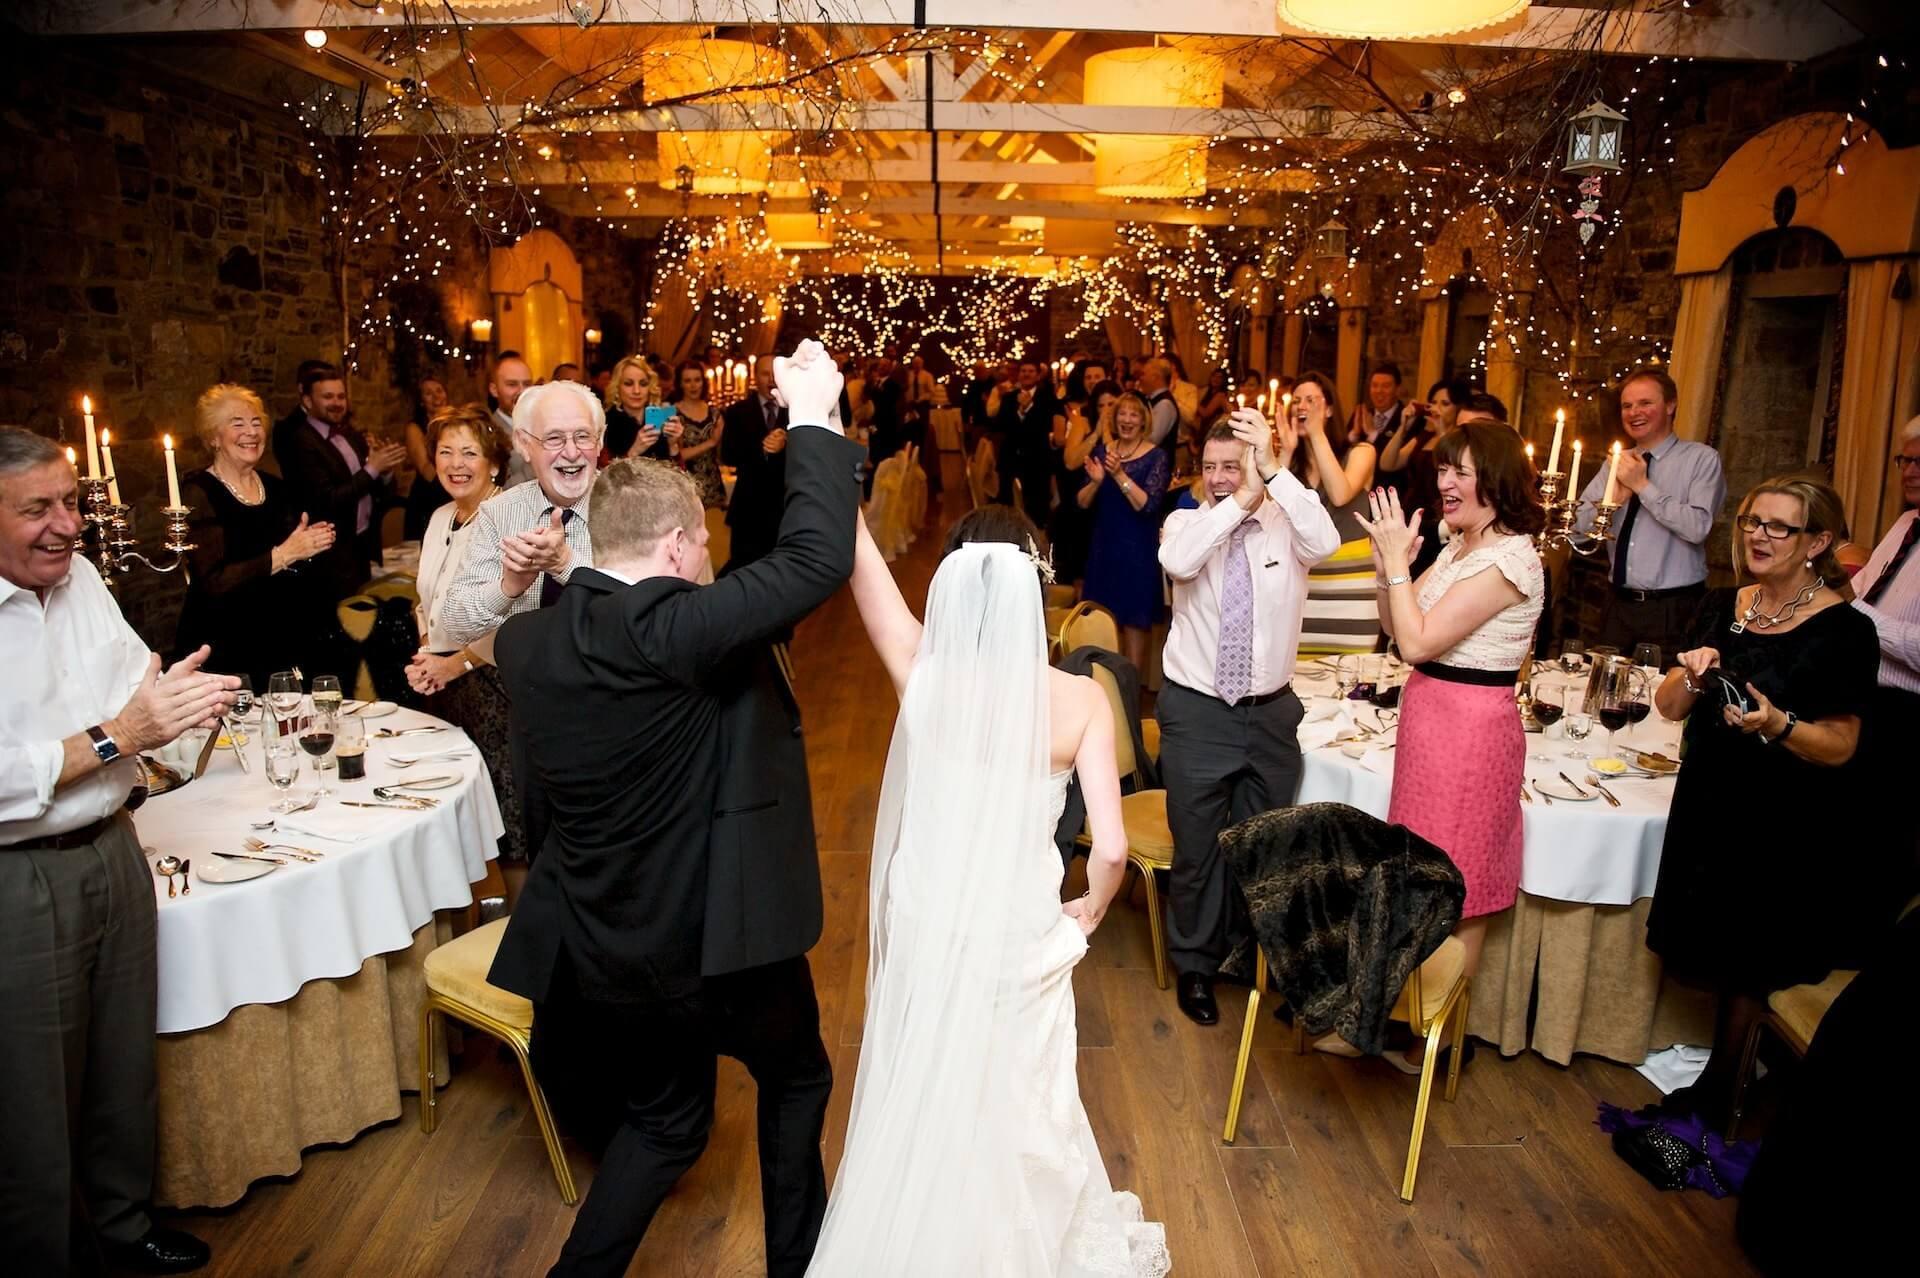 029 Wedding Meath Ballymagarvey Village Bride Groom Arrive at Reception